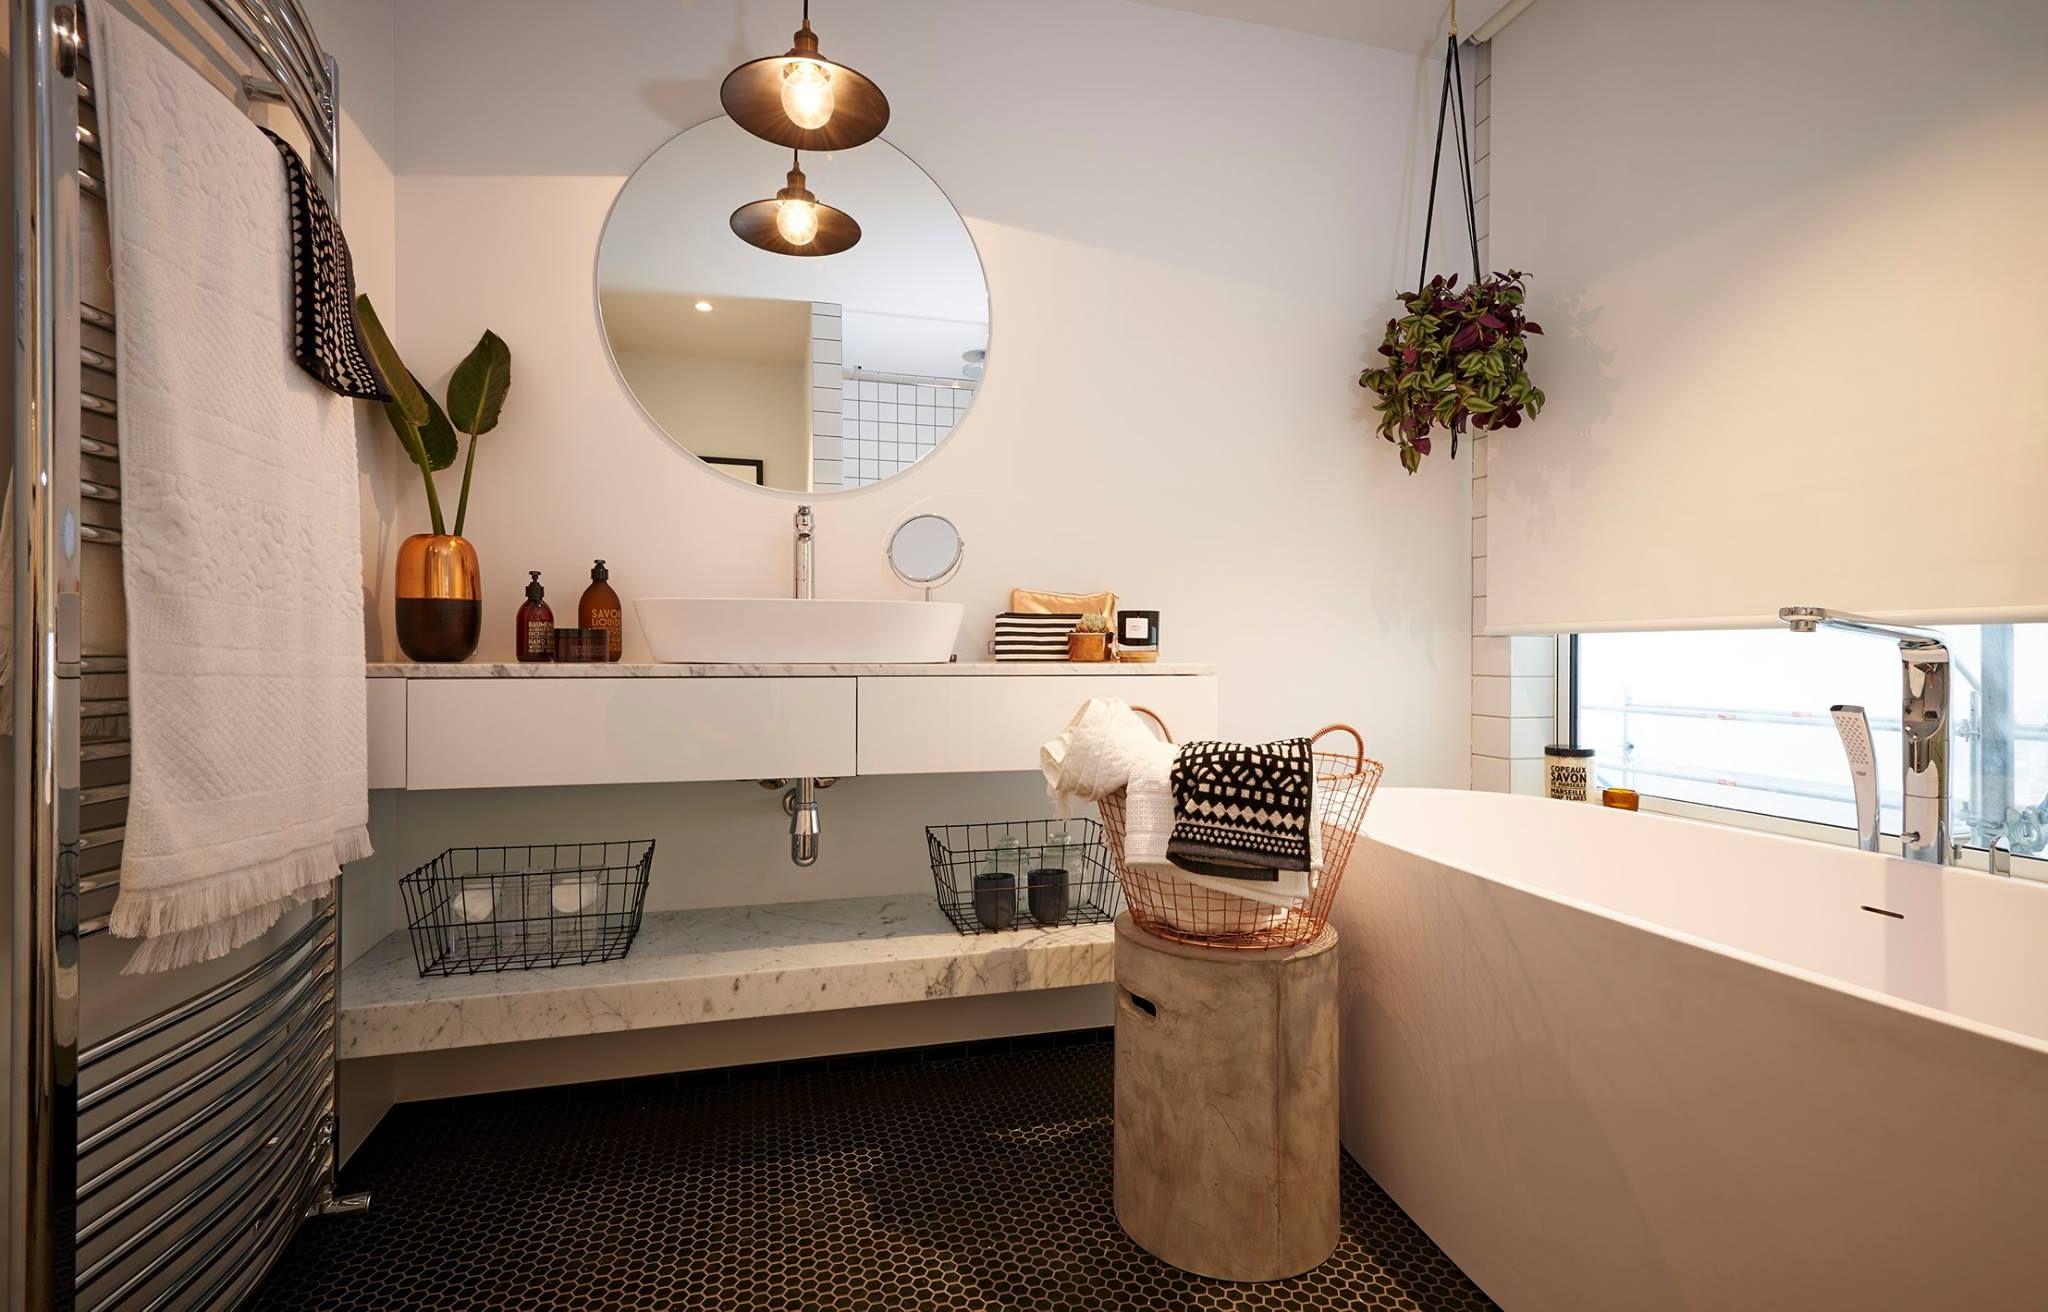 alex & corban's bathroom - the block nz - visit blog.curate.co.nz